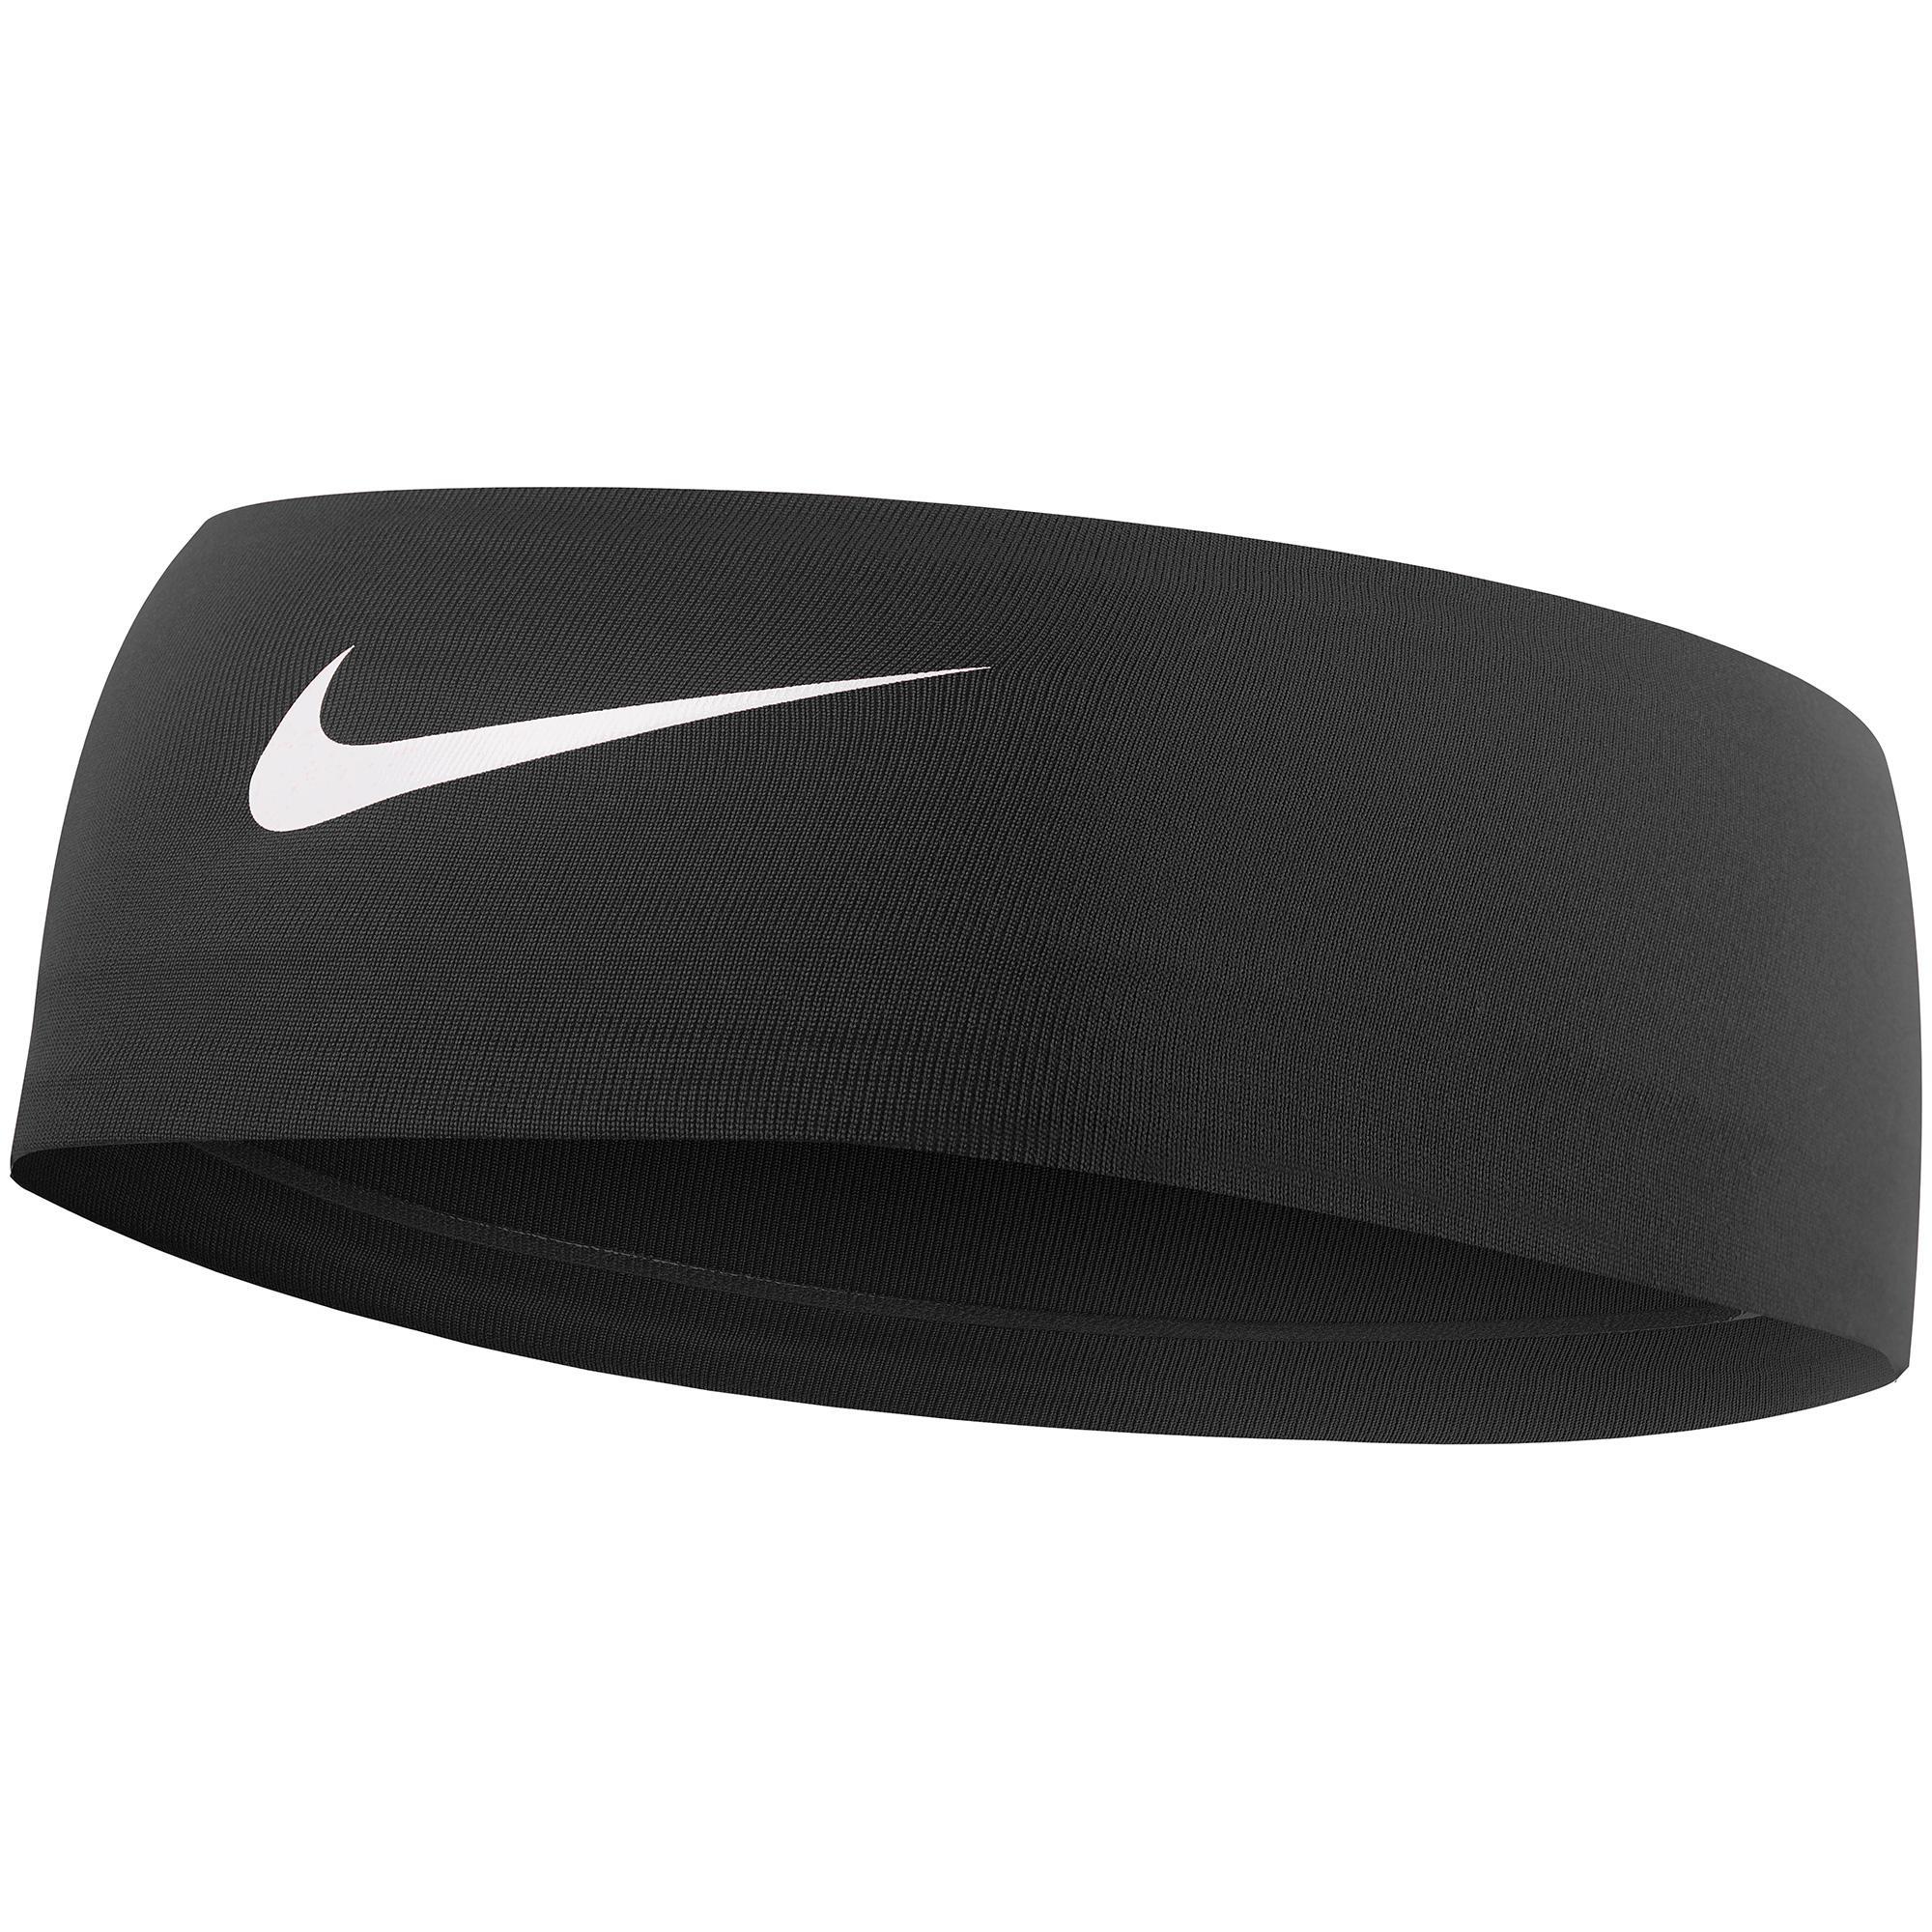 Nike Fury Headband 2.0 - Black - Tennisnuts.com